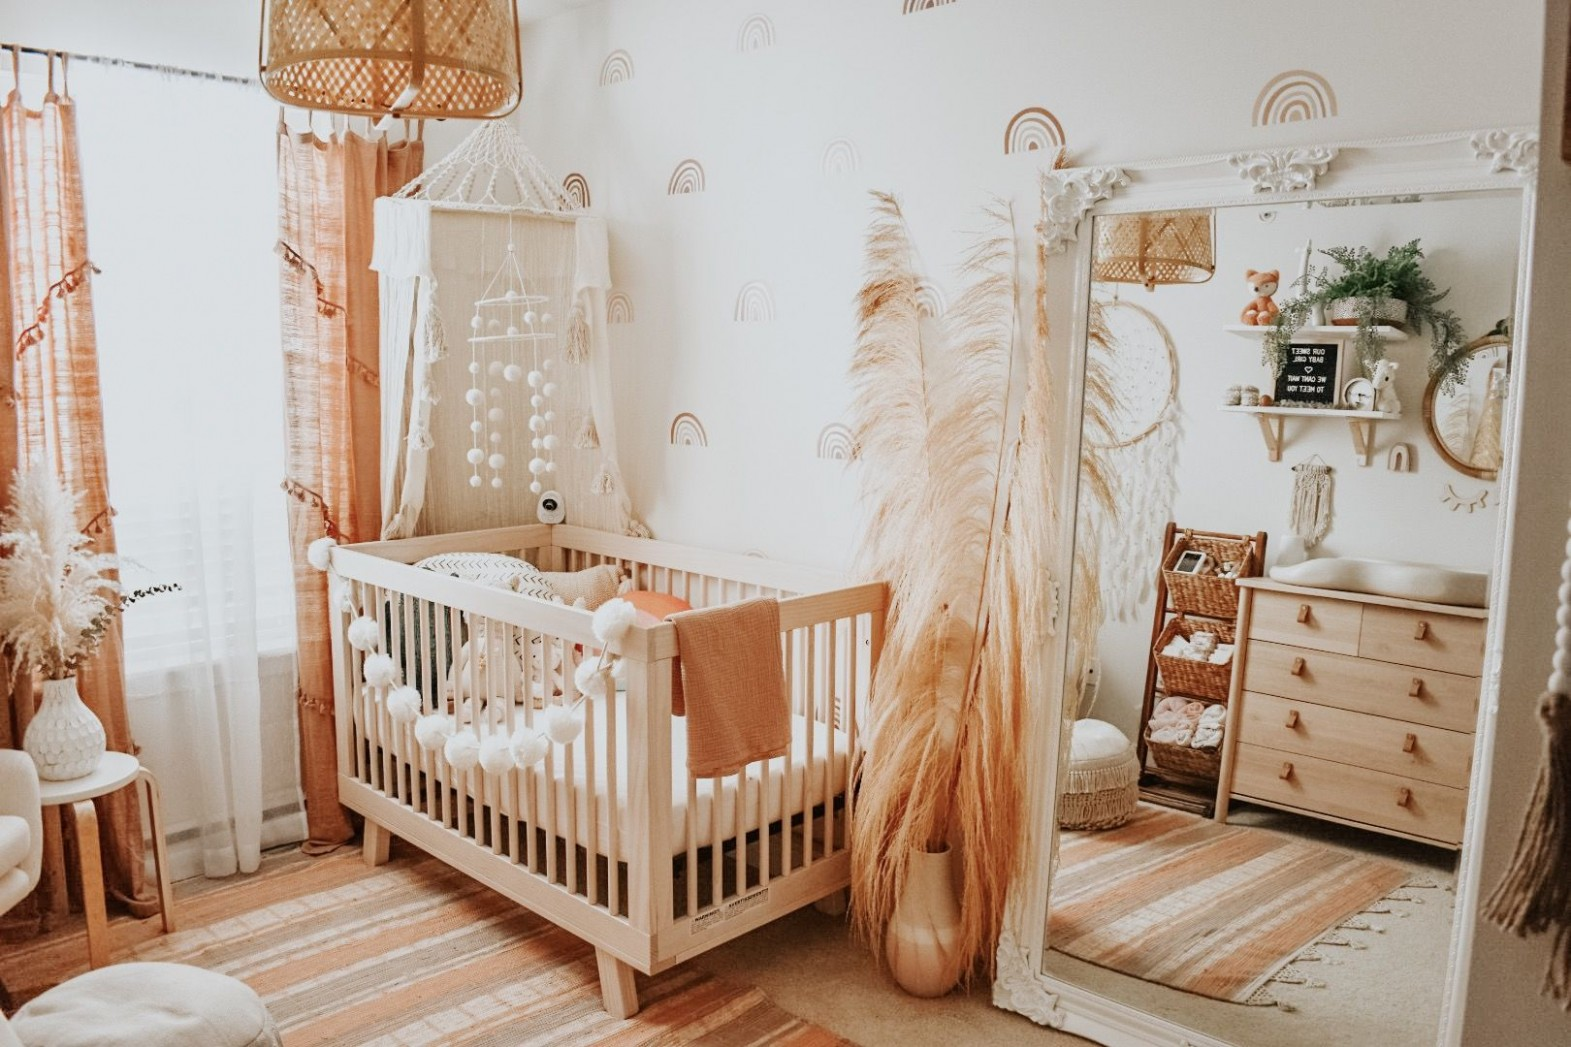 Boho Baby Nursery - Project Nursery in 9  Boho baby nursery  - Baby Room Near Me